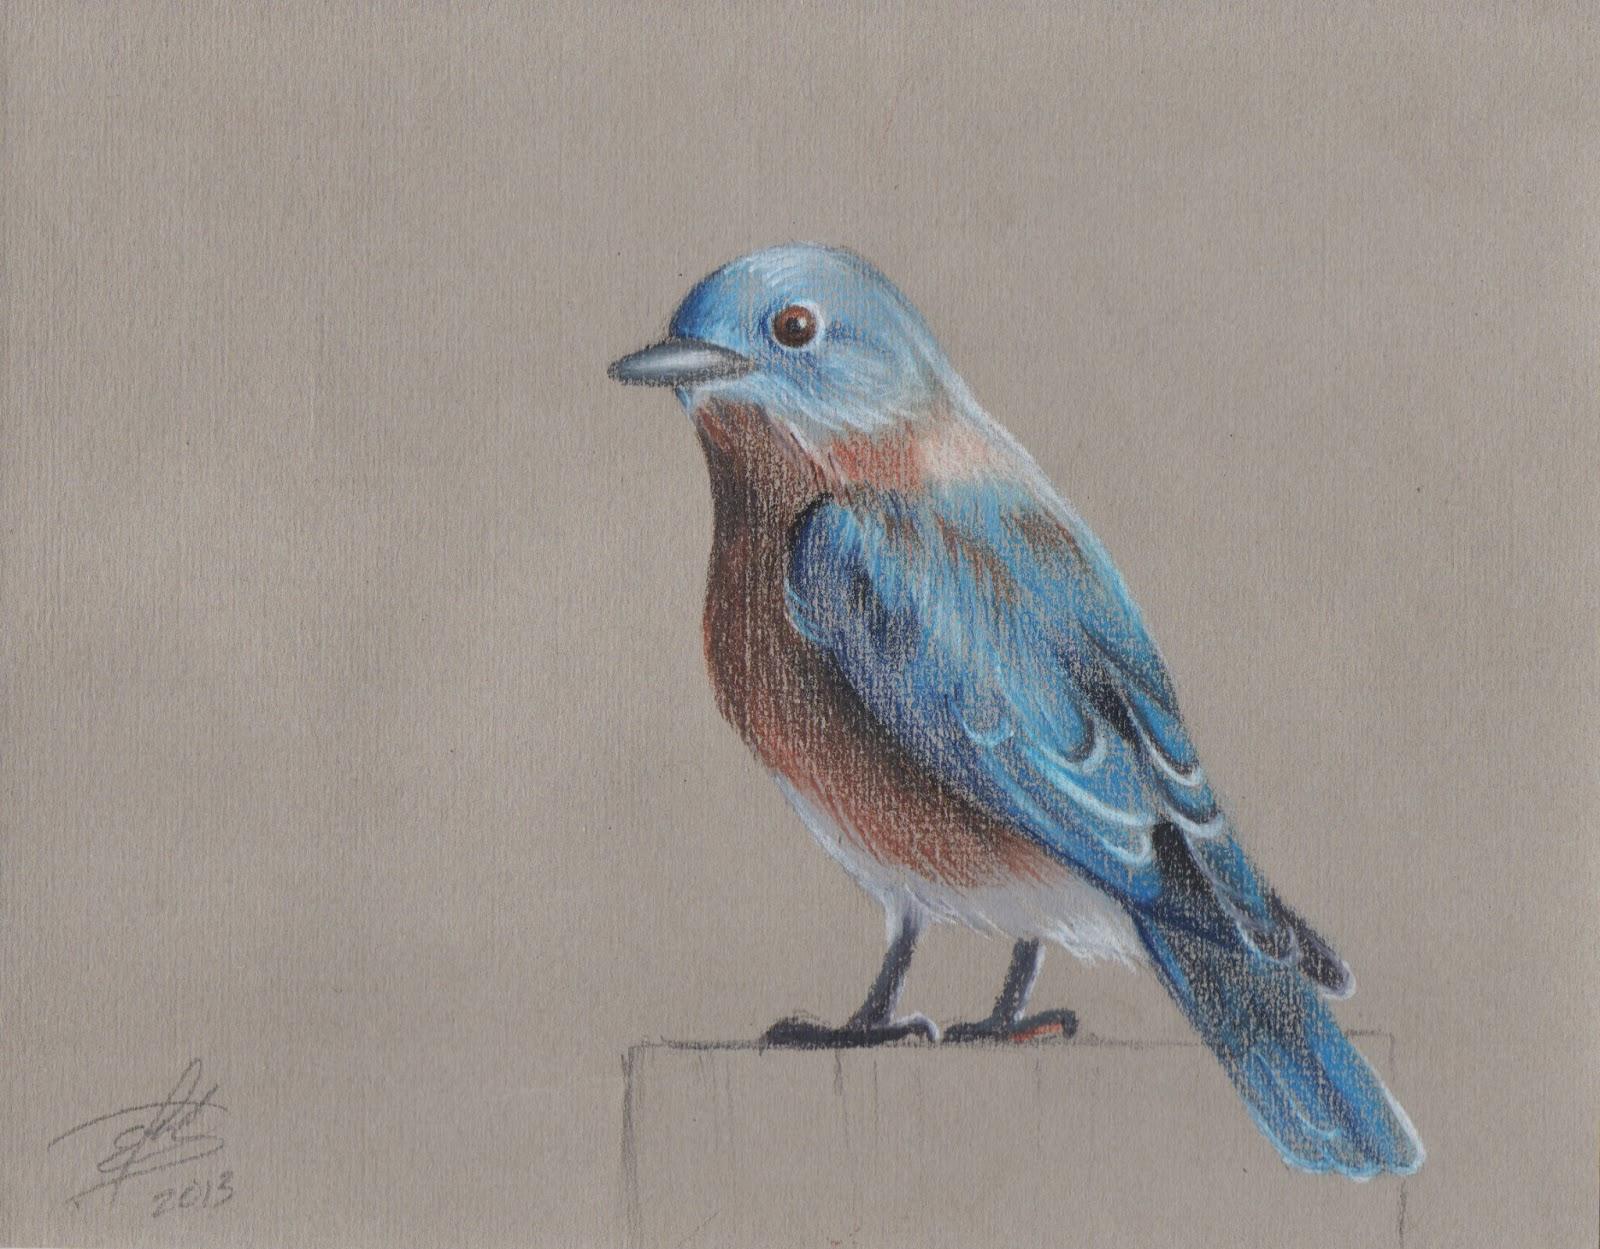 Mexican birds drawings tania fuentes for Azulejo azul